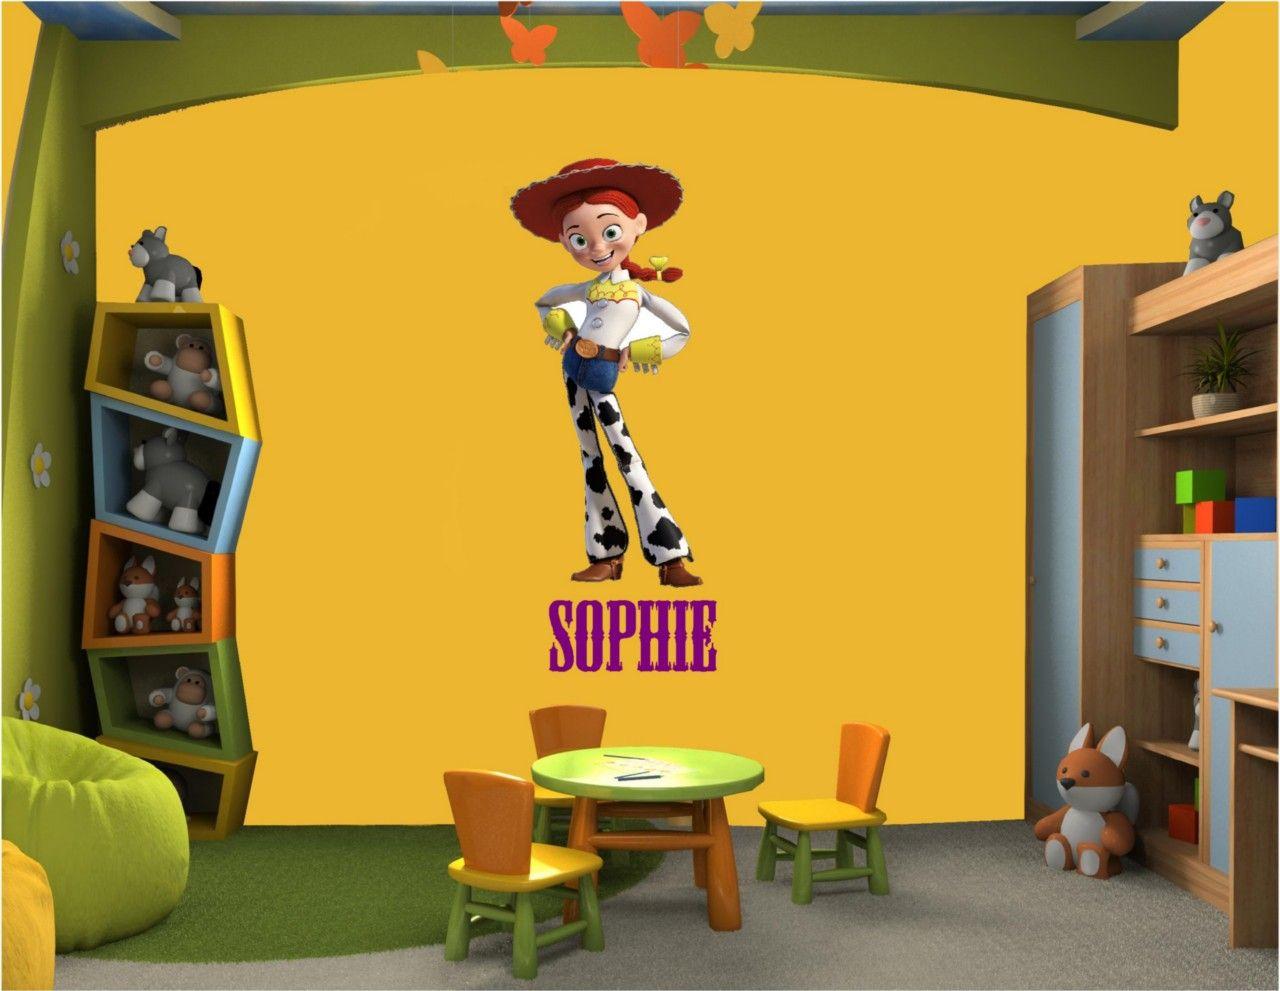 Toy Story JESSIE Vinyl Wall Art Sticker Decal   eBay   Toy Story ...